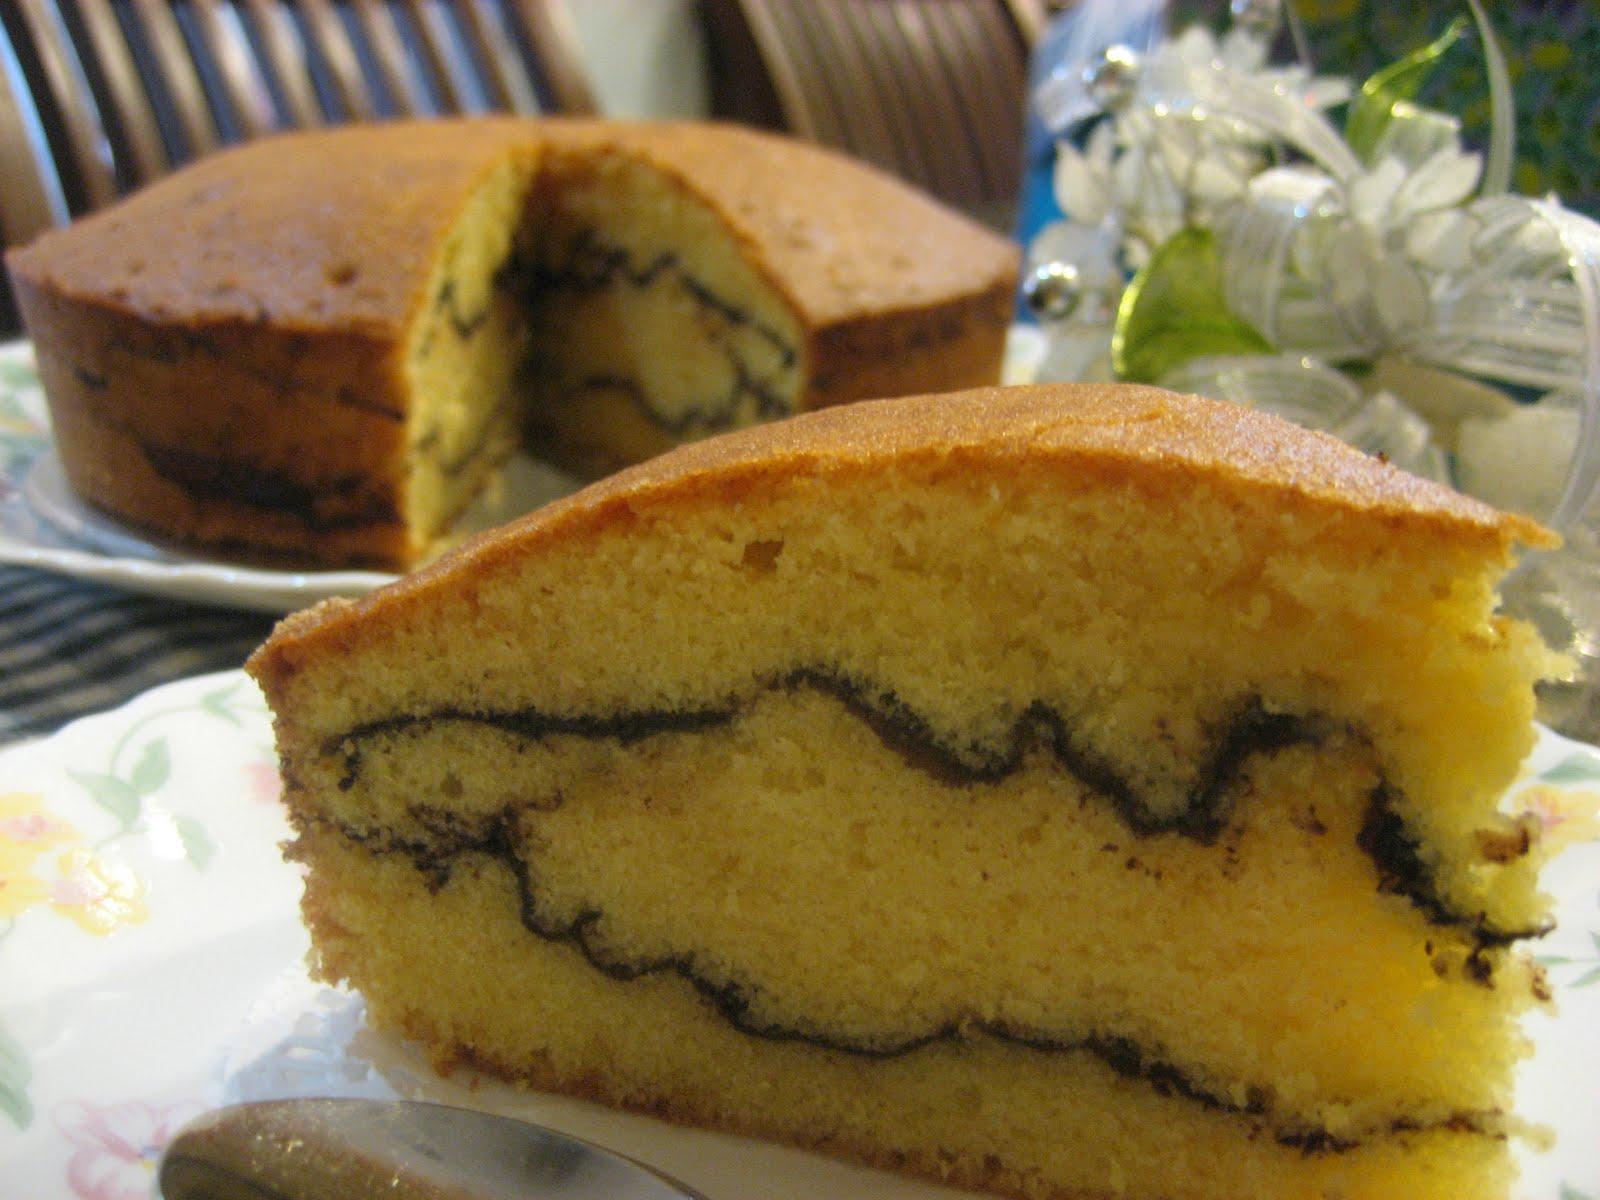 diri buat kek rengkas dan mudah pembuatan kek ini juga menggunakan